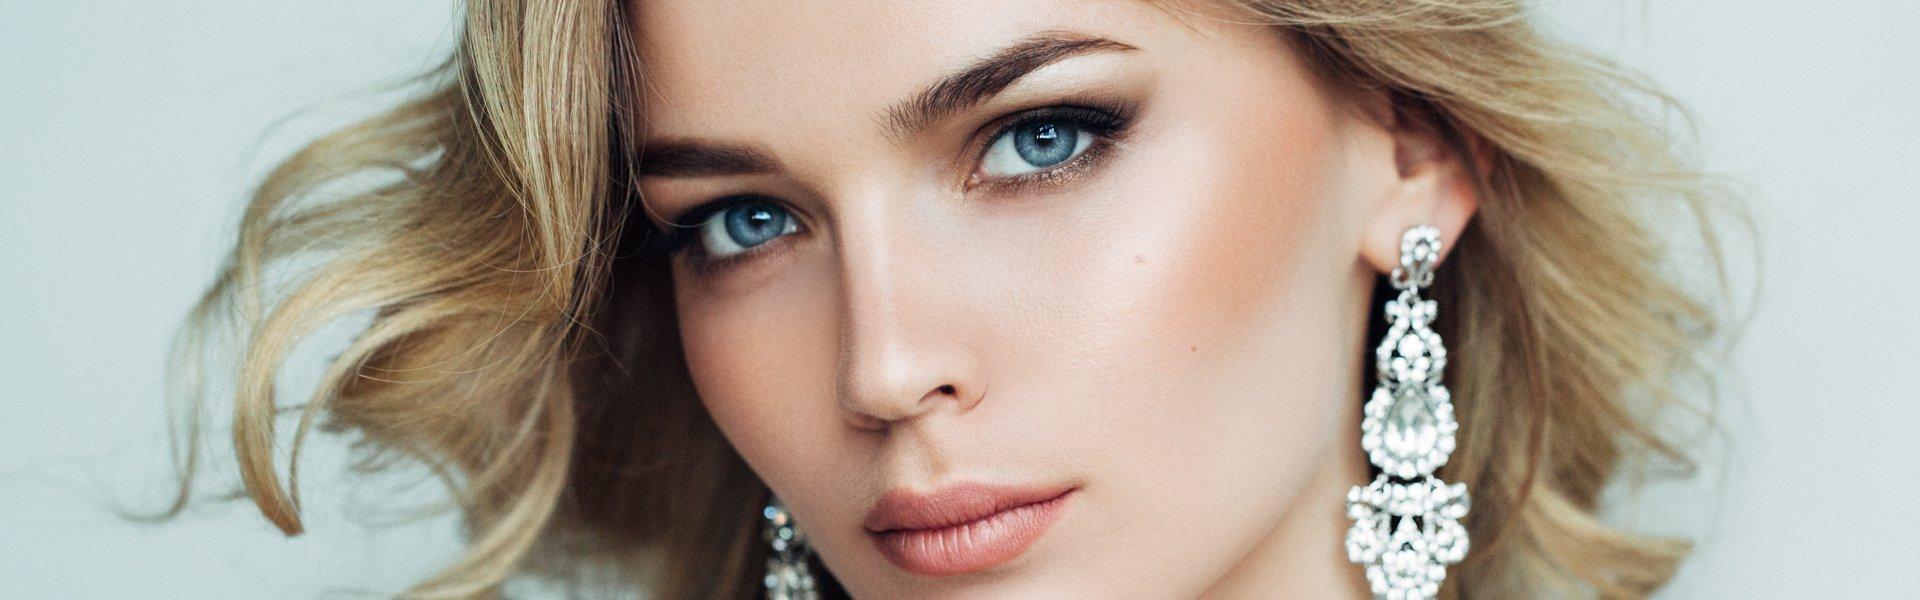 eyebrow and eyelash services